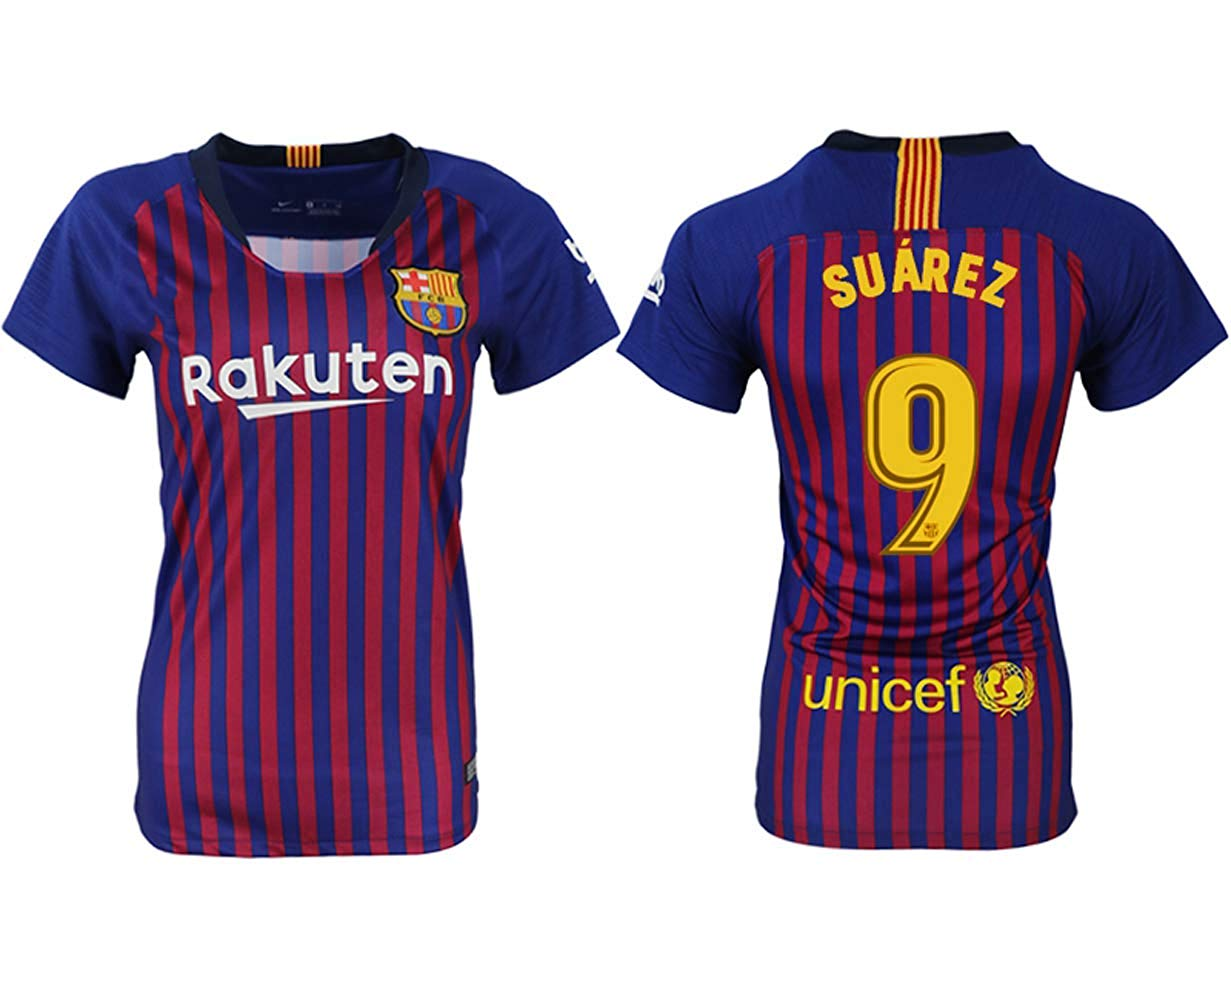 5210c70ee Get Quotations · Fun jersey Suarez  9 Barcelona 2018-2019 Home Women s  Soccer Uniforms